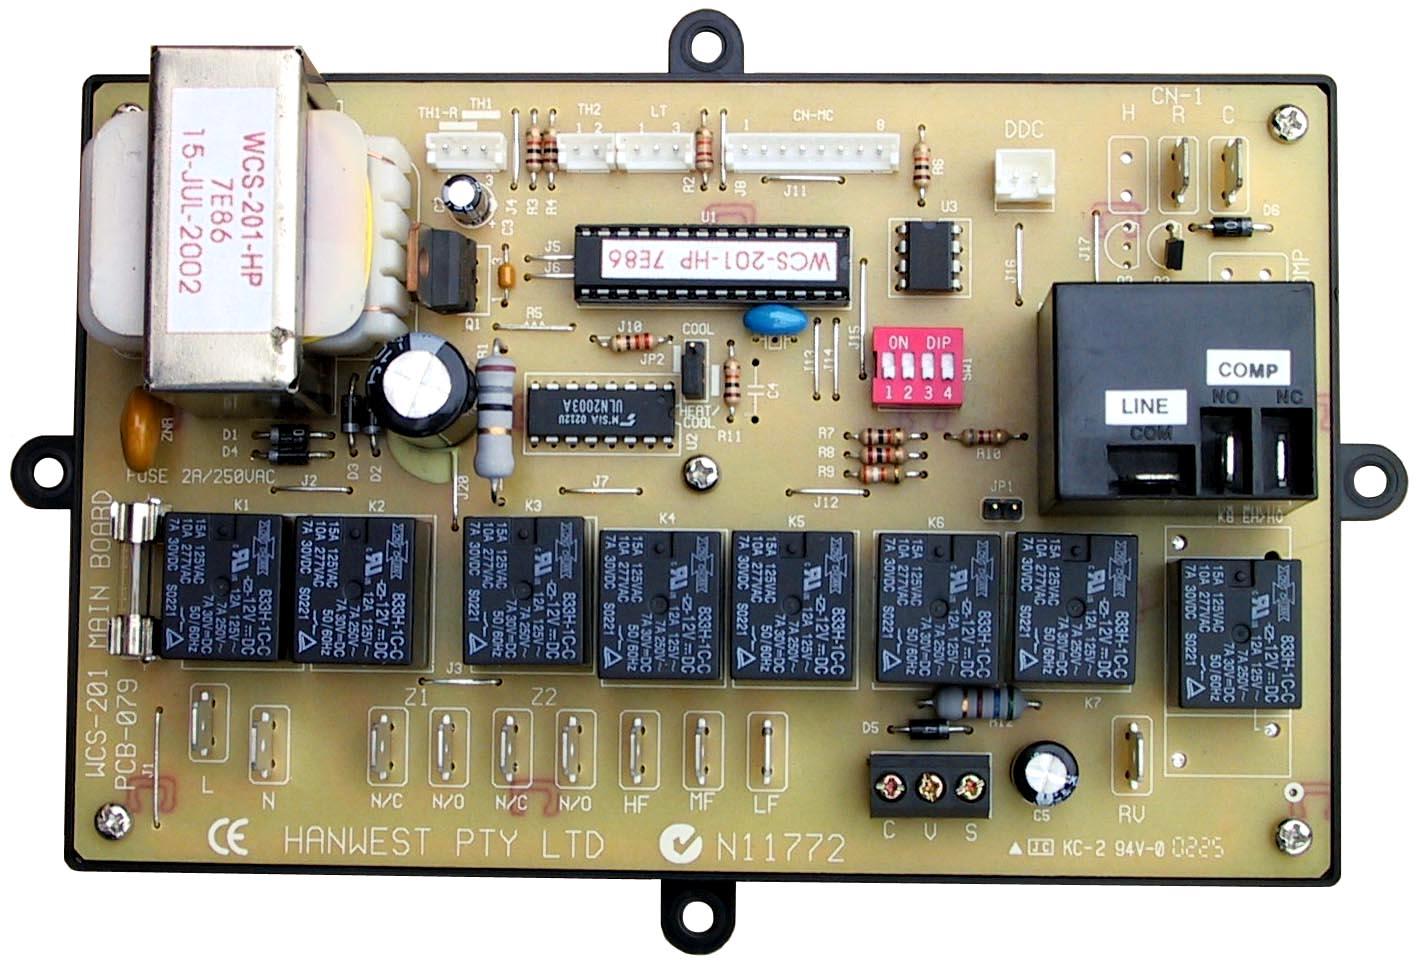 Controls Amp Accessories Hanwest Aqua Systems Pty Ltd